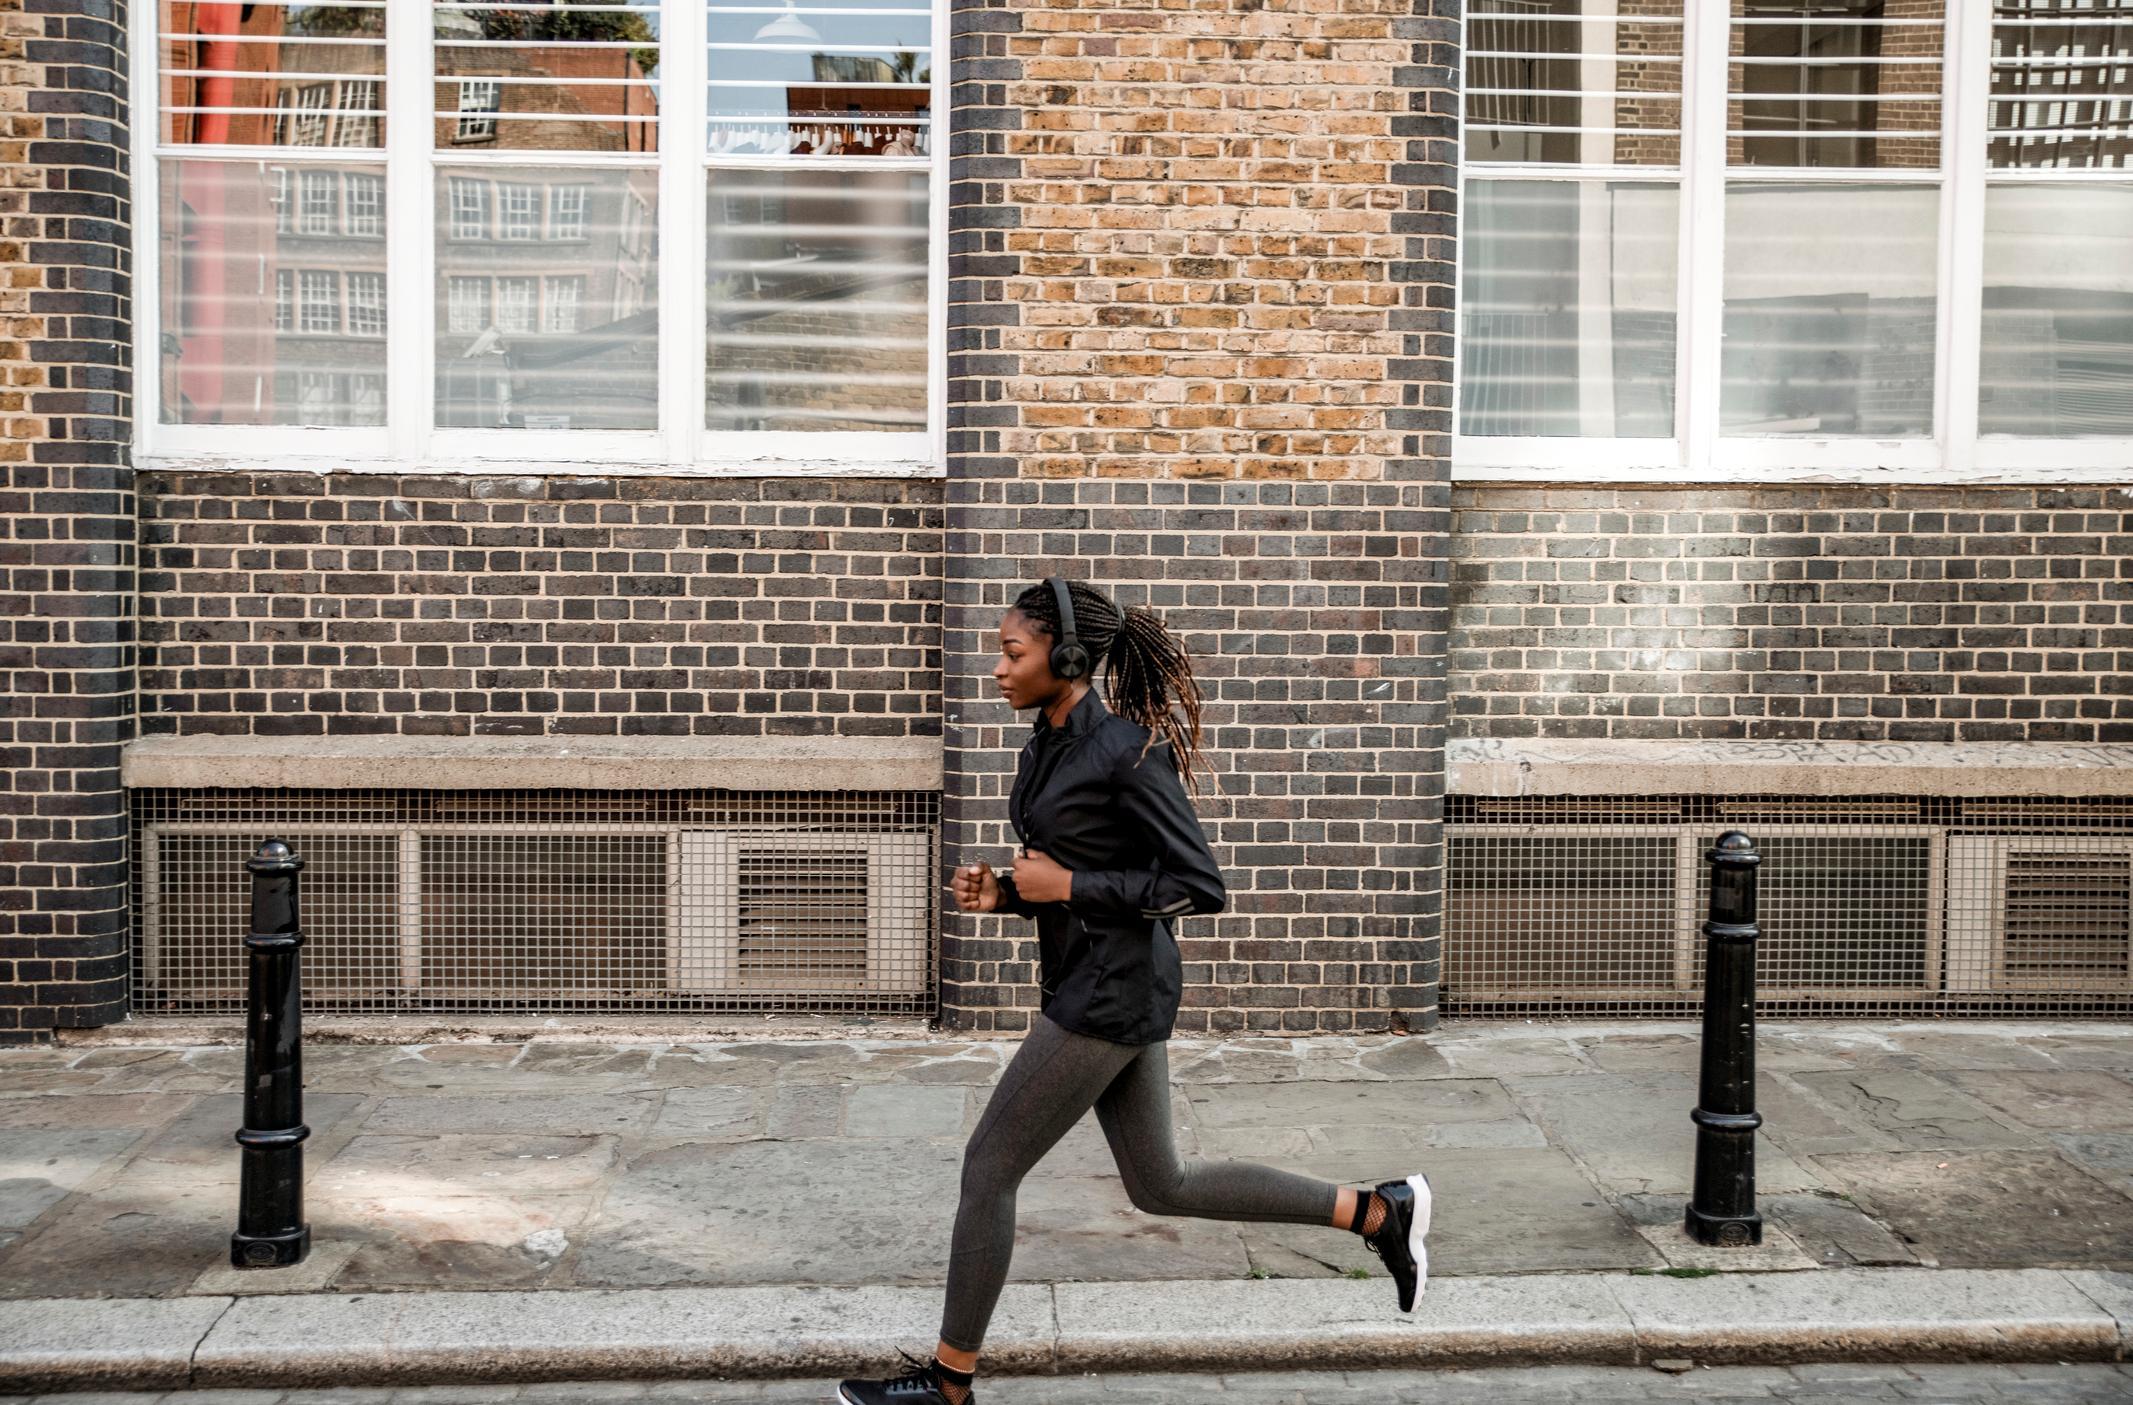 3-running-woman-1569943215753.jpg